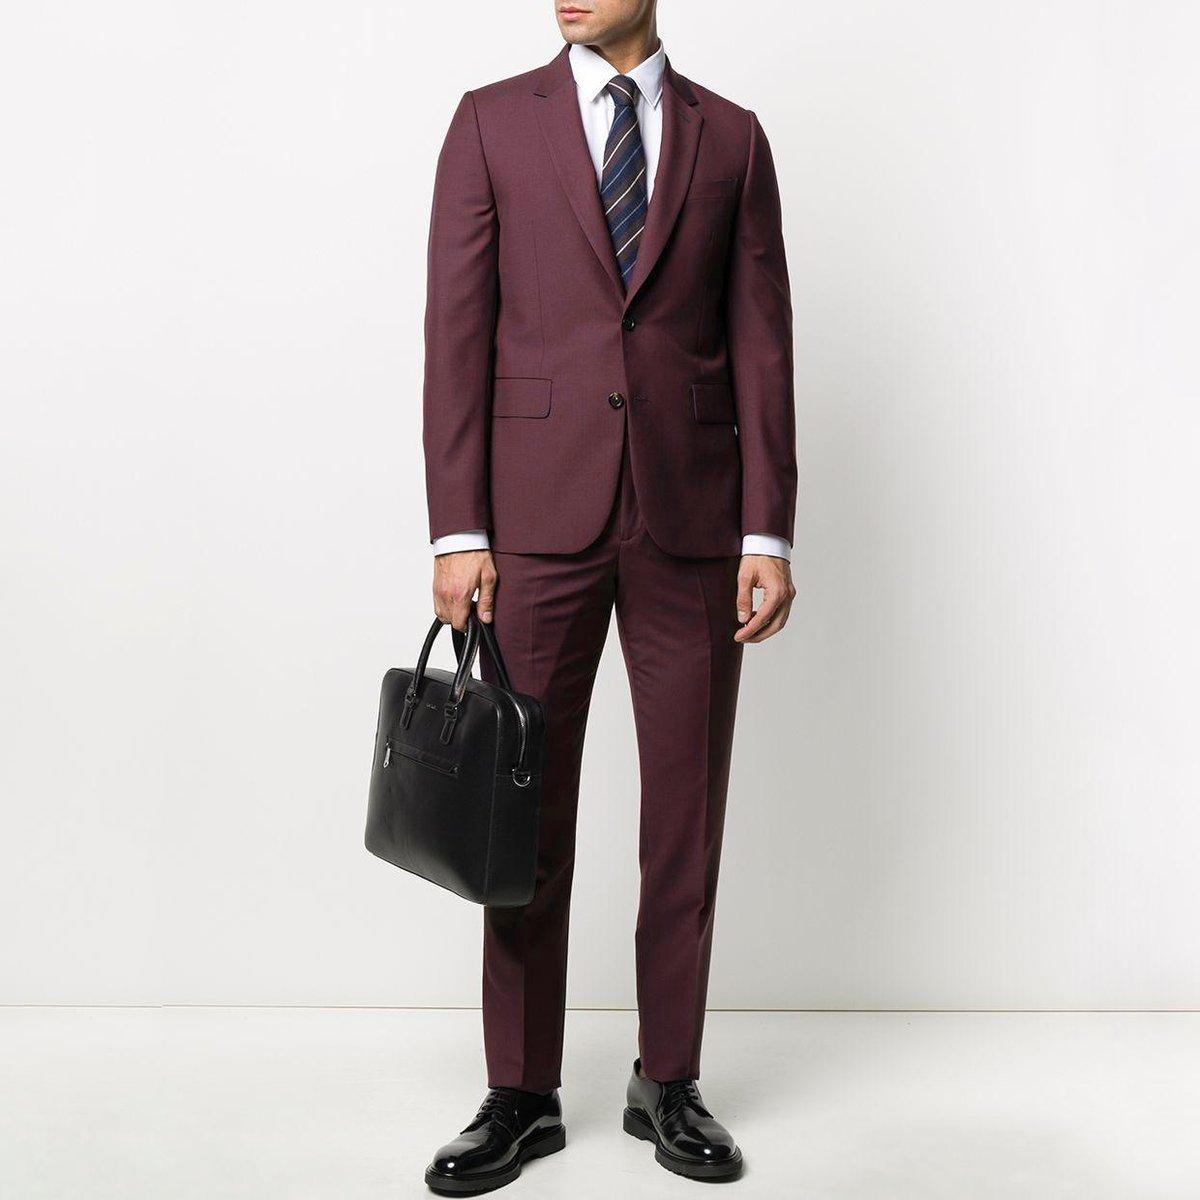 paul-smith-purple-Slim-fit-Two-piece-Suit.jpg